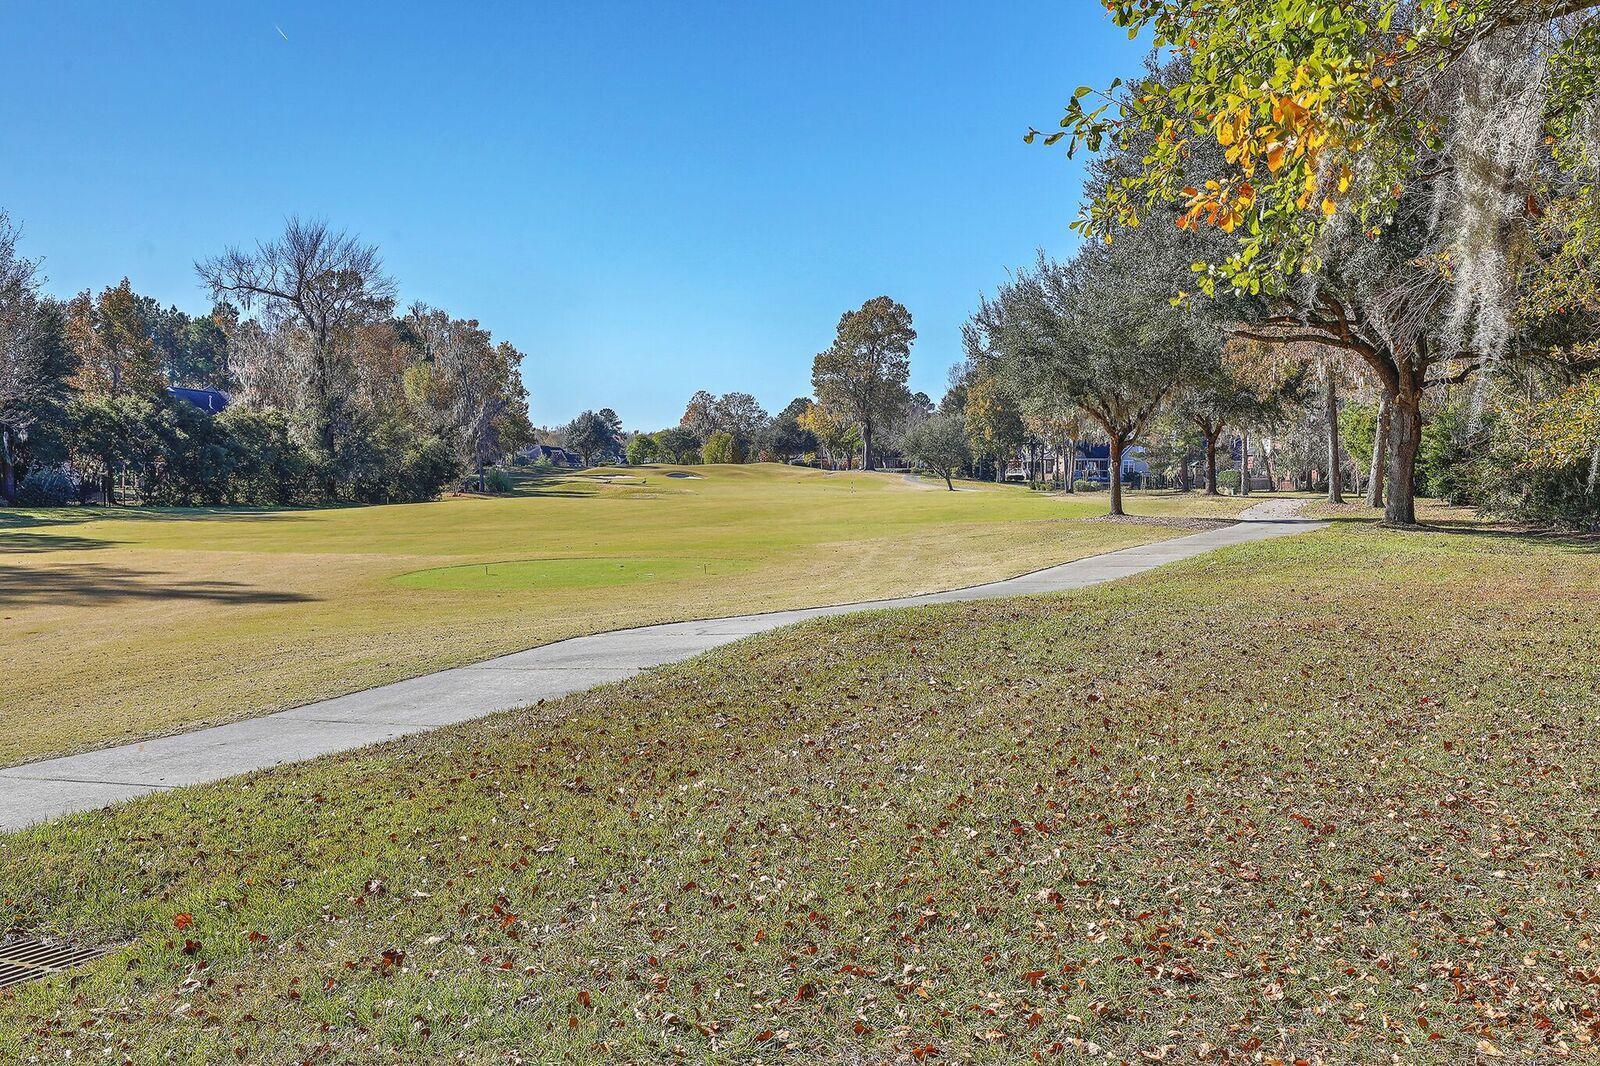 Photo of 4230 Club Course Dr, North Charleston, SC 29420